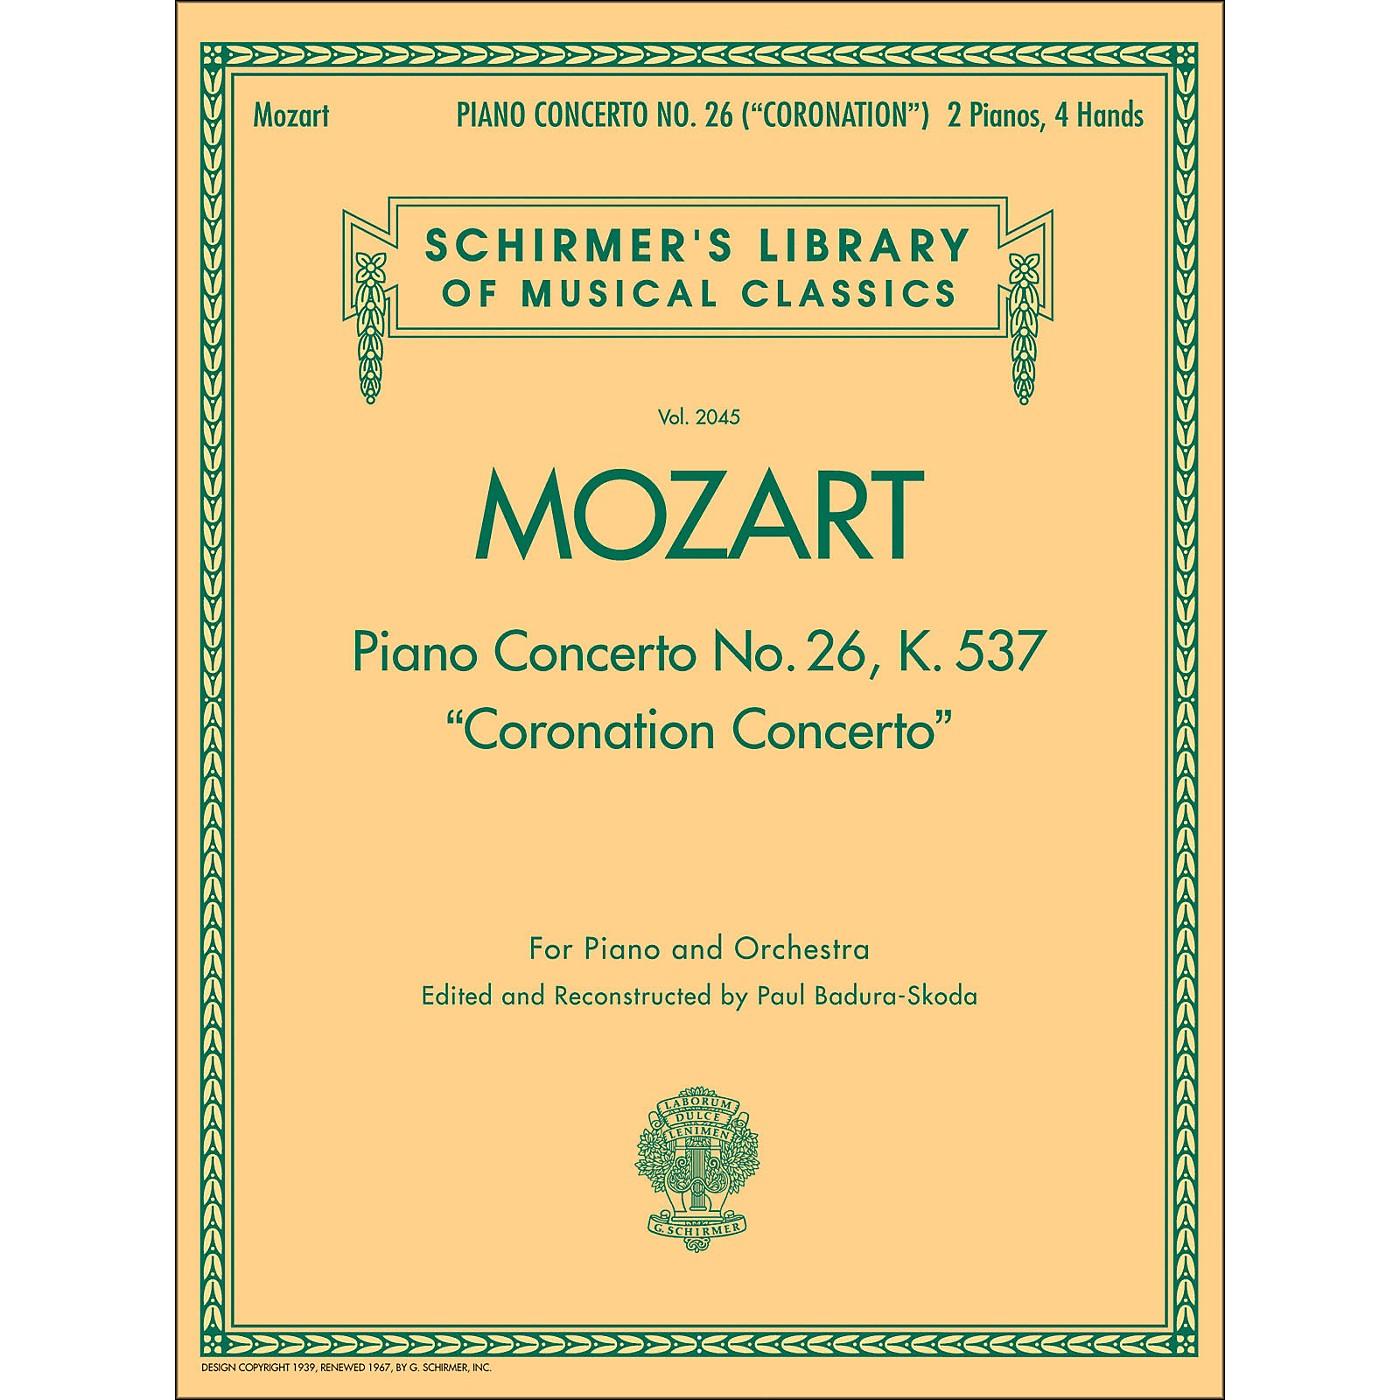 G. Schirmer Coronation Concerto 2 Pno/4Hnd piano Concerto No 26 K537 By Mozart thumbnail